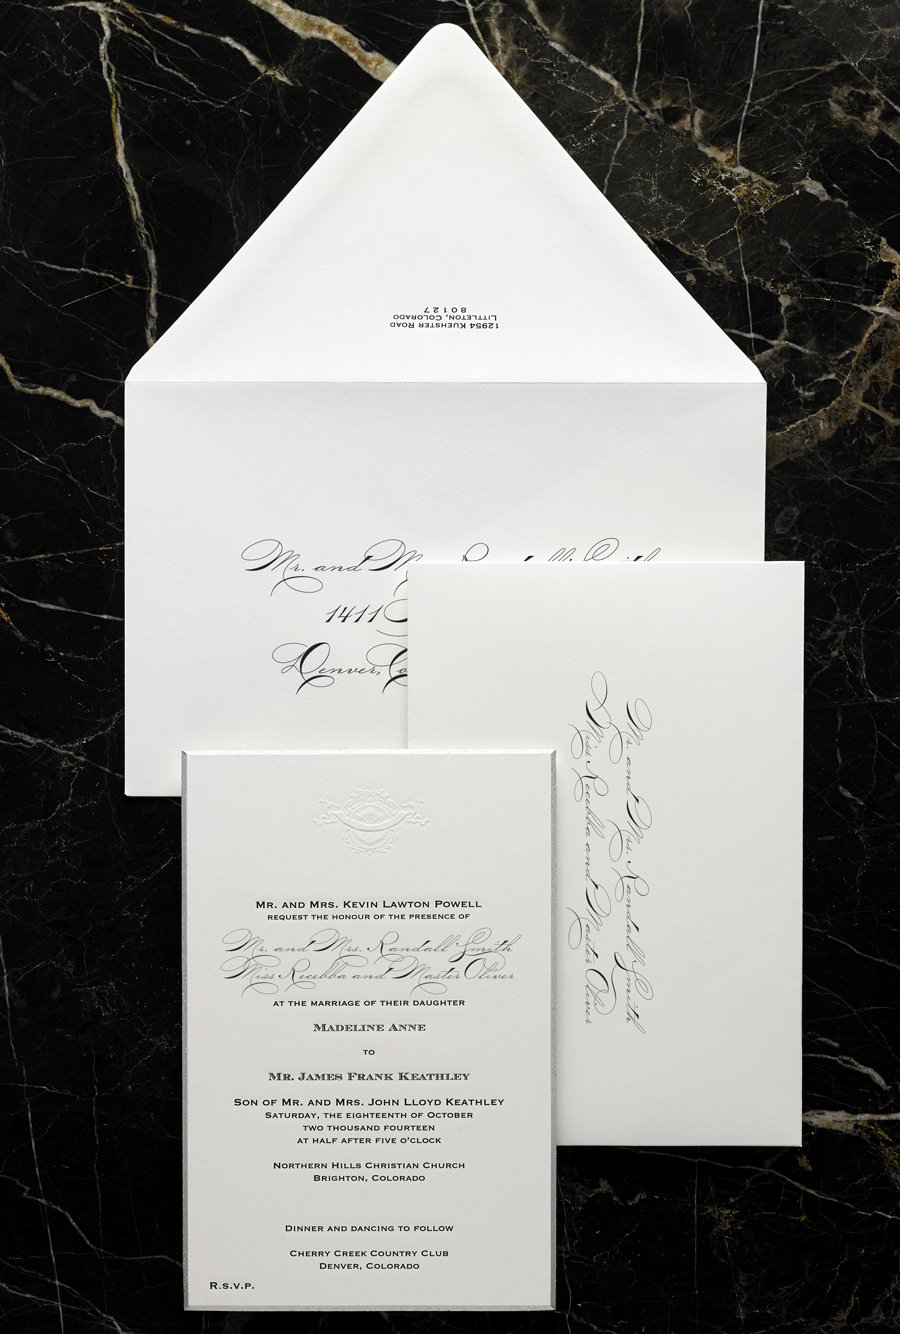 Modern formal Wedding Invitation Design Etiquette